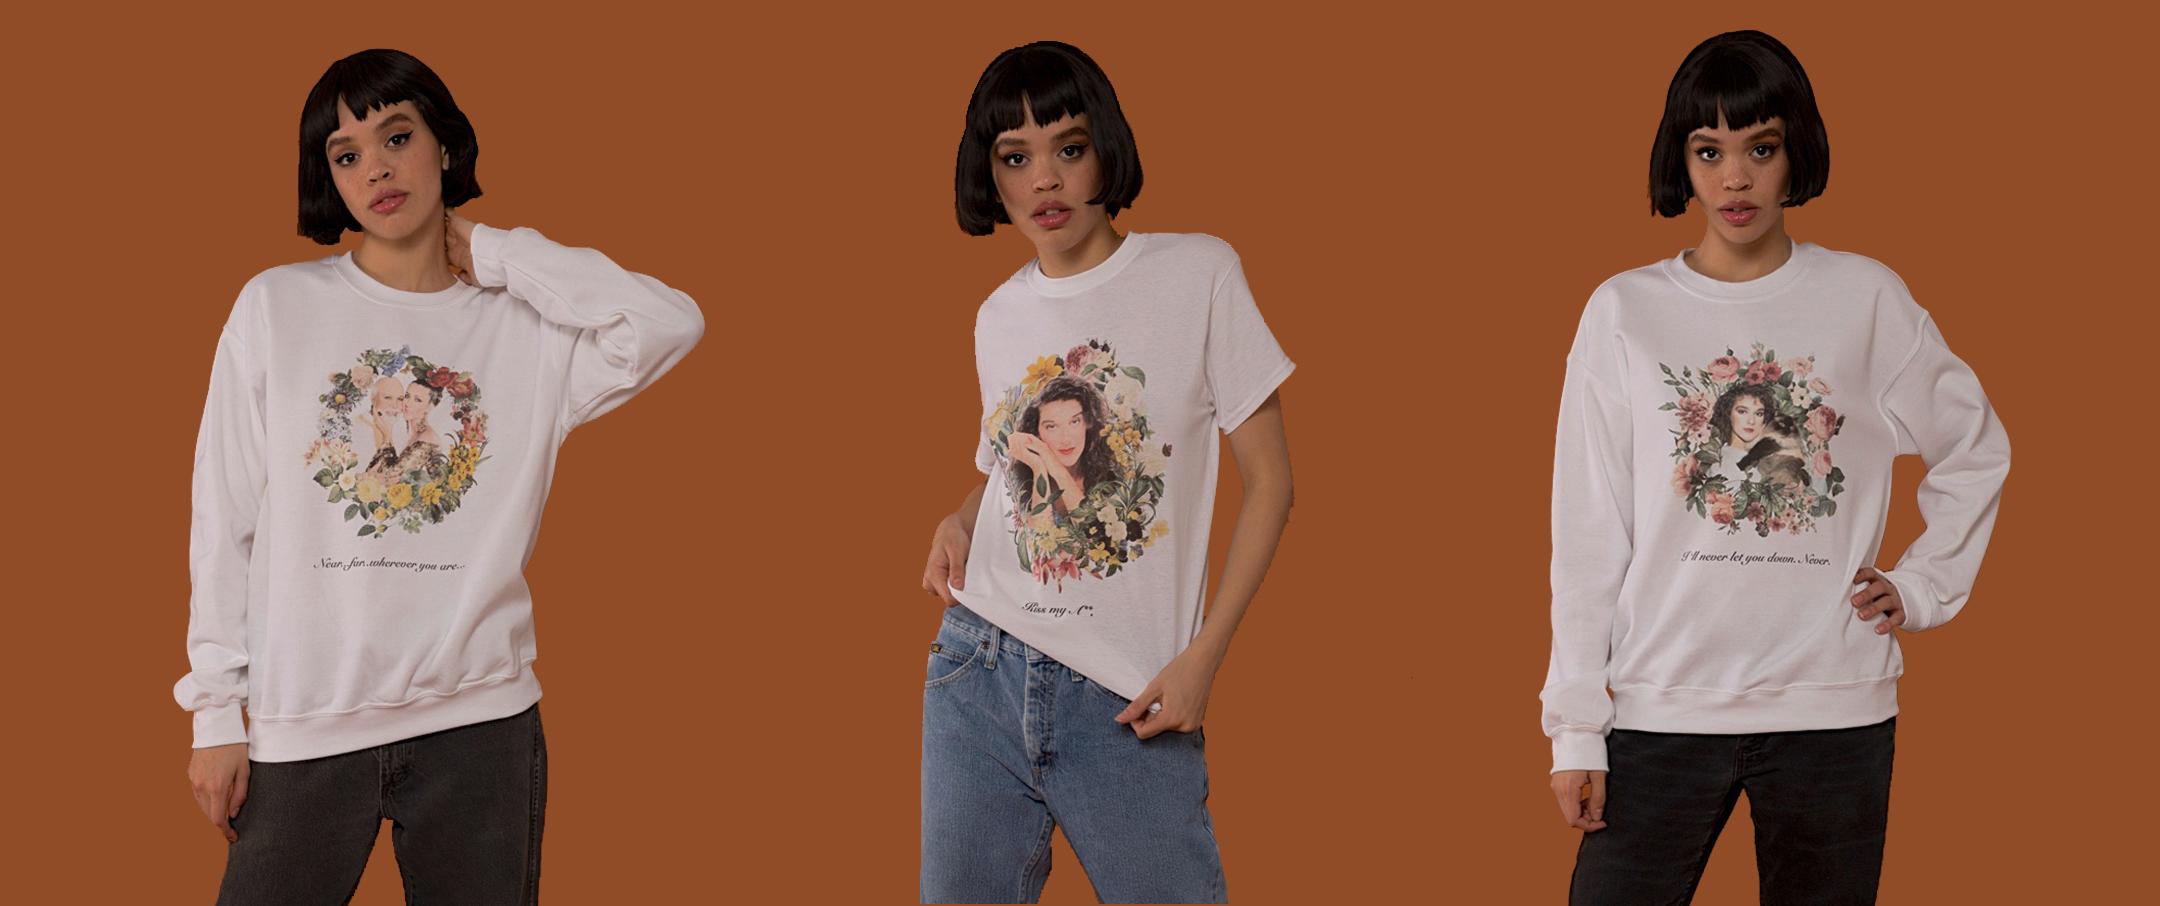 Shop the Celine Collection